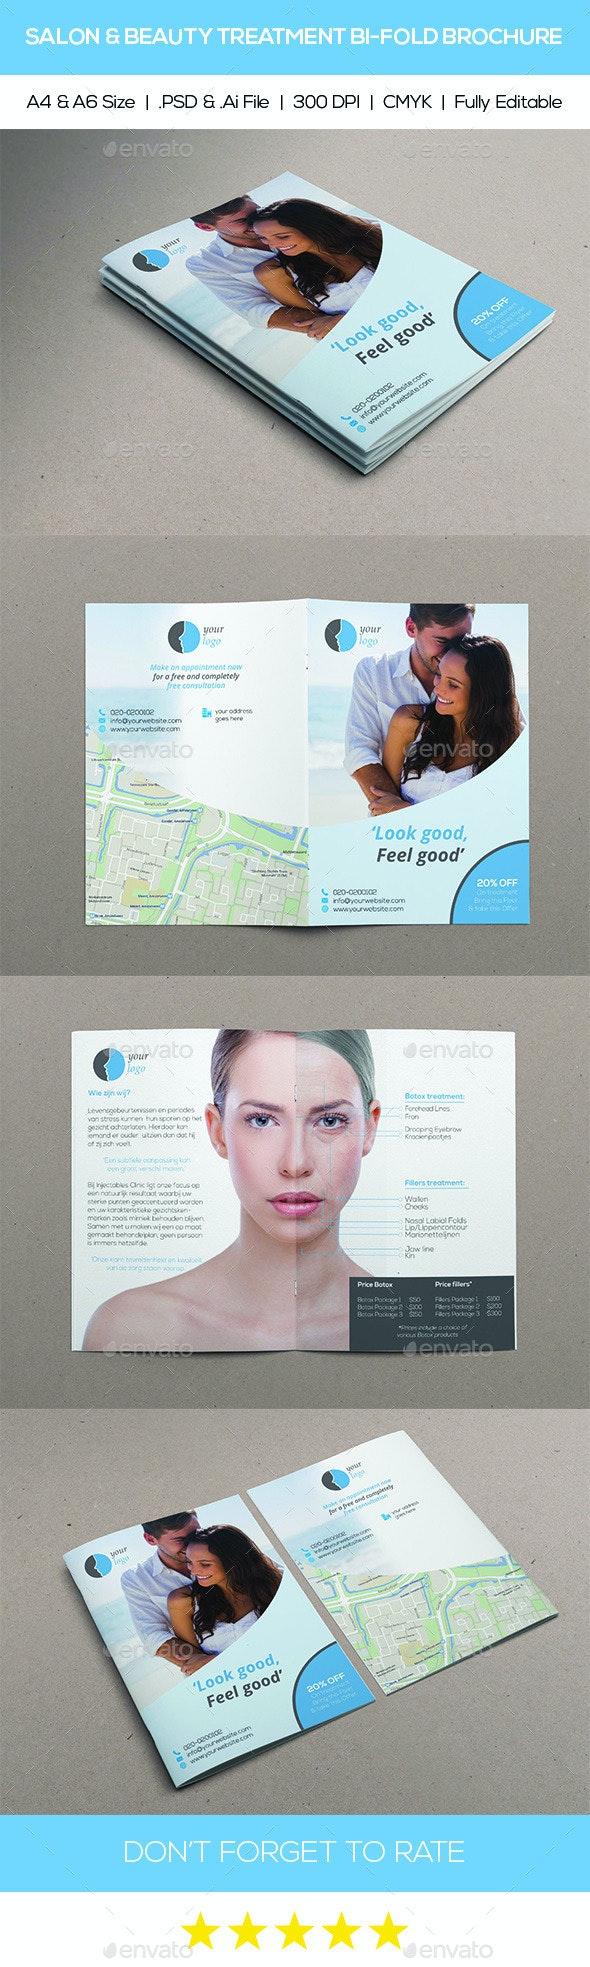 Salon & Beaty Treatment Bi-Fold Brochure - Catalogs Brochures